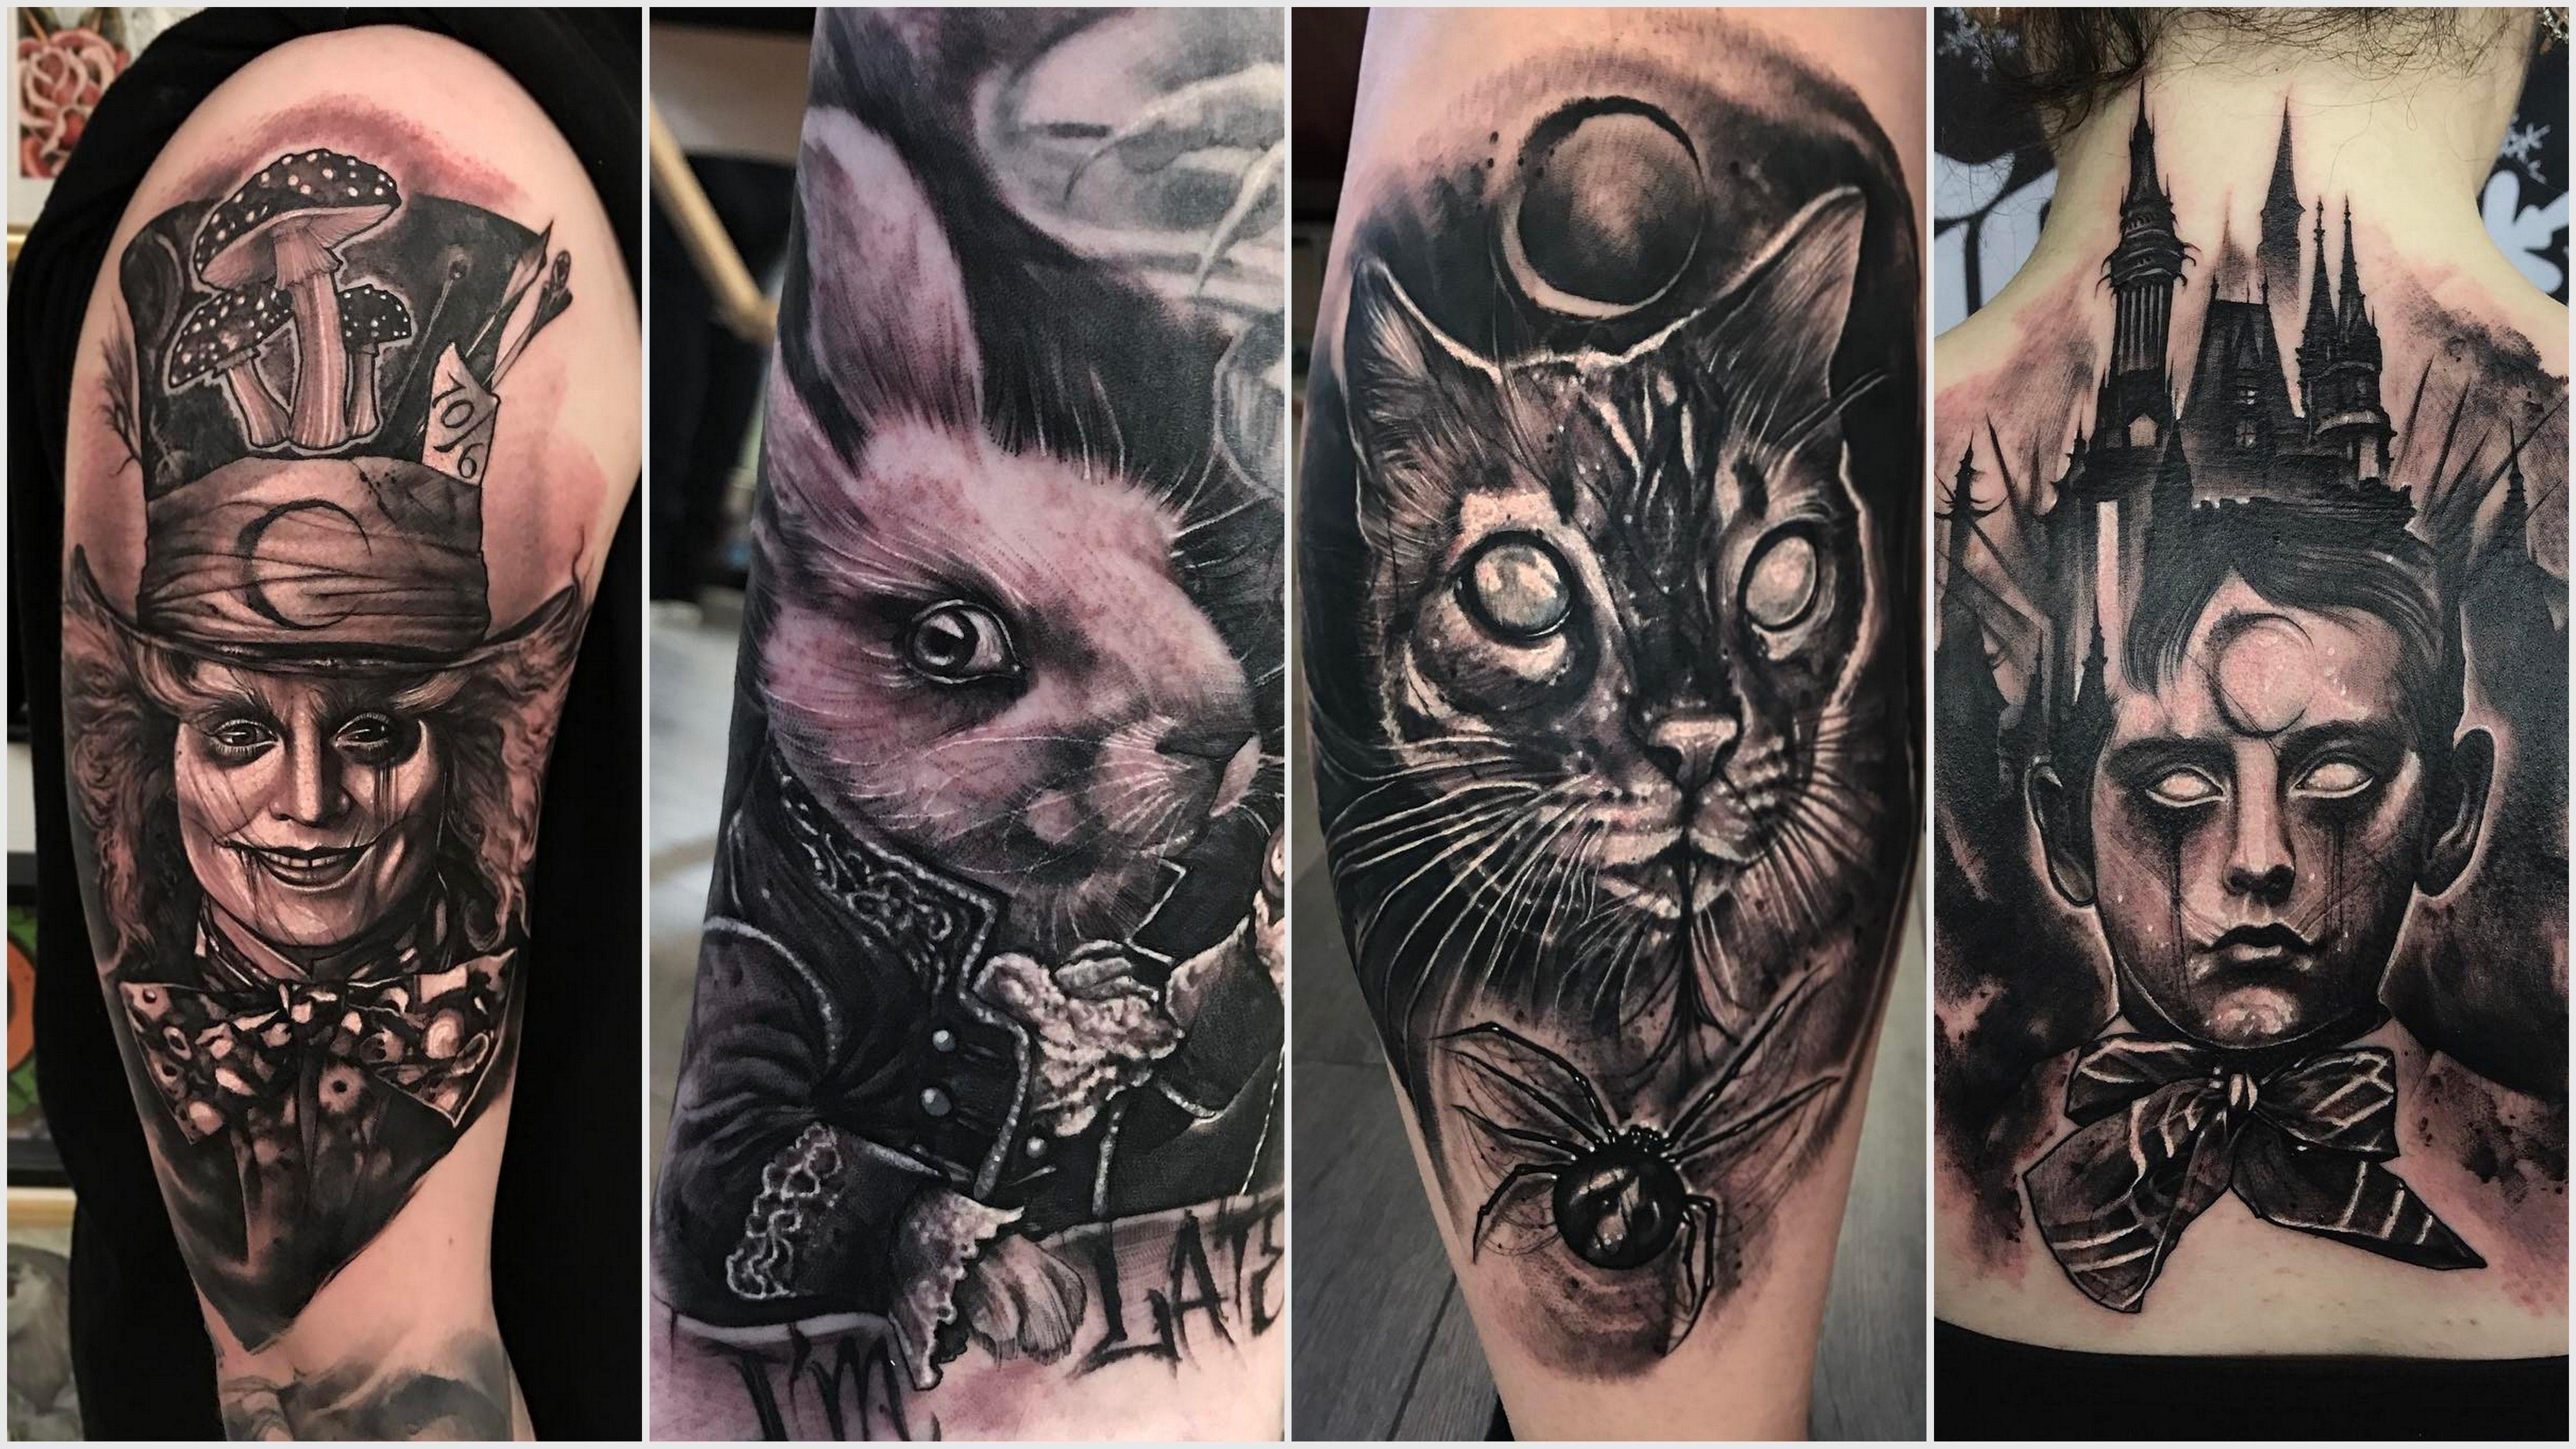 Interview With Vegan Tattoo Artist Anrijs Straume Liverpool Uk Vegan Tattoo Studios Vegan Tattoo Tattoo Artists Tattoo Studio